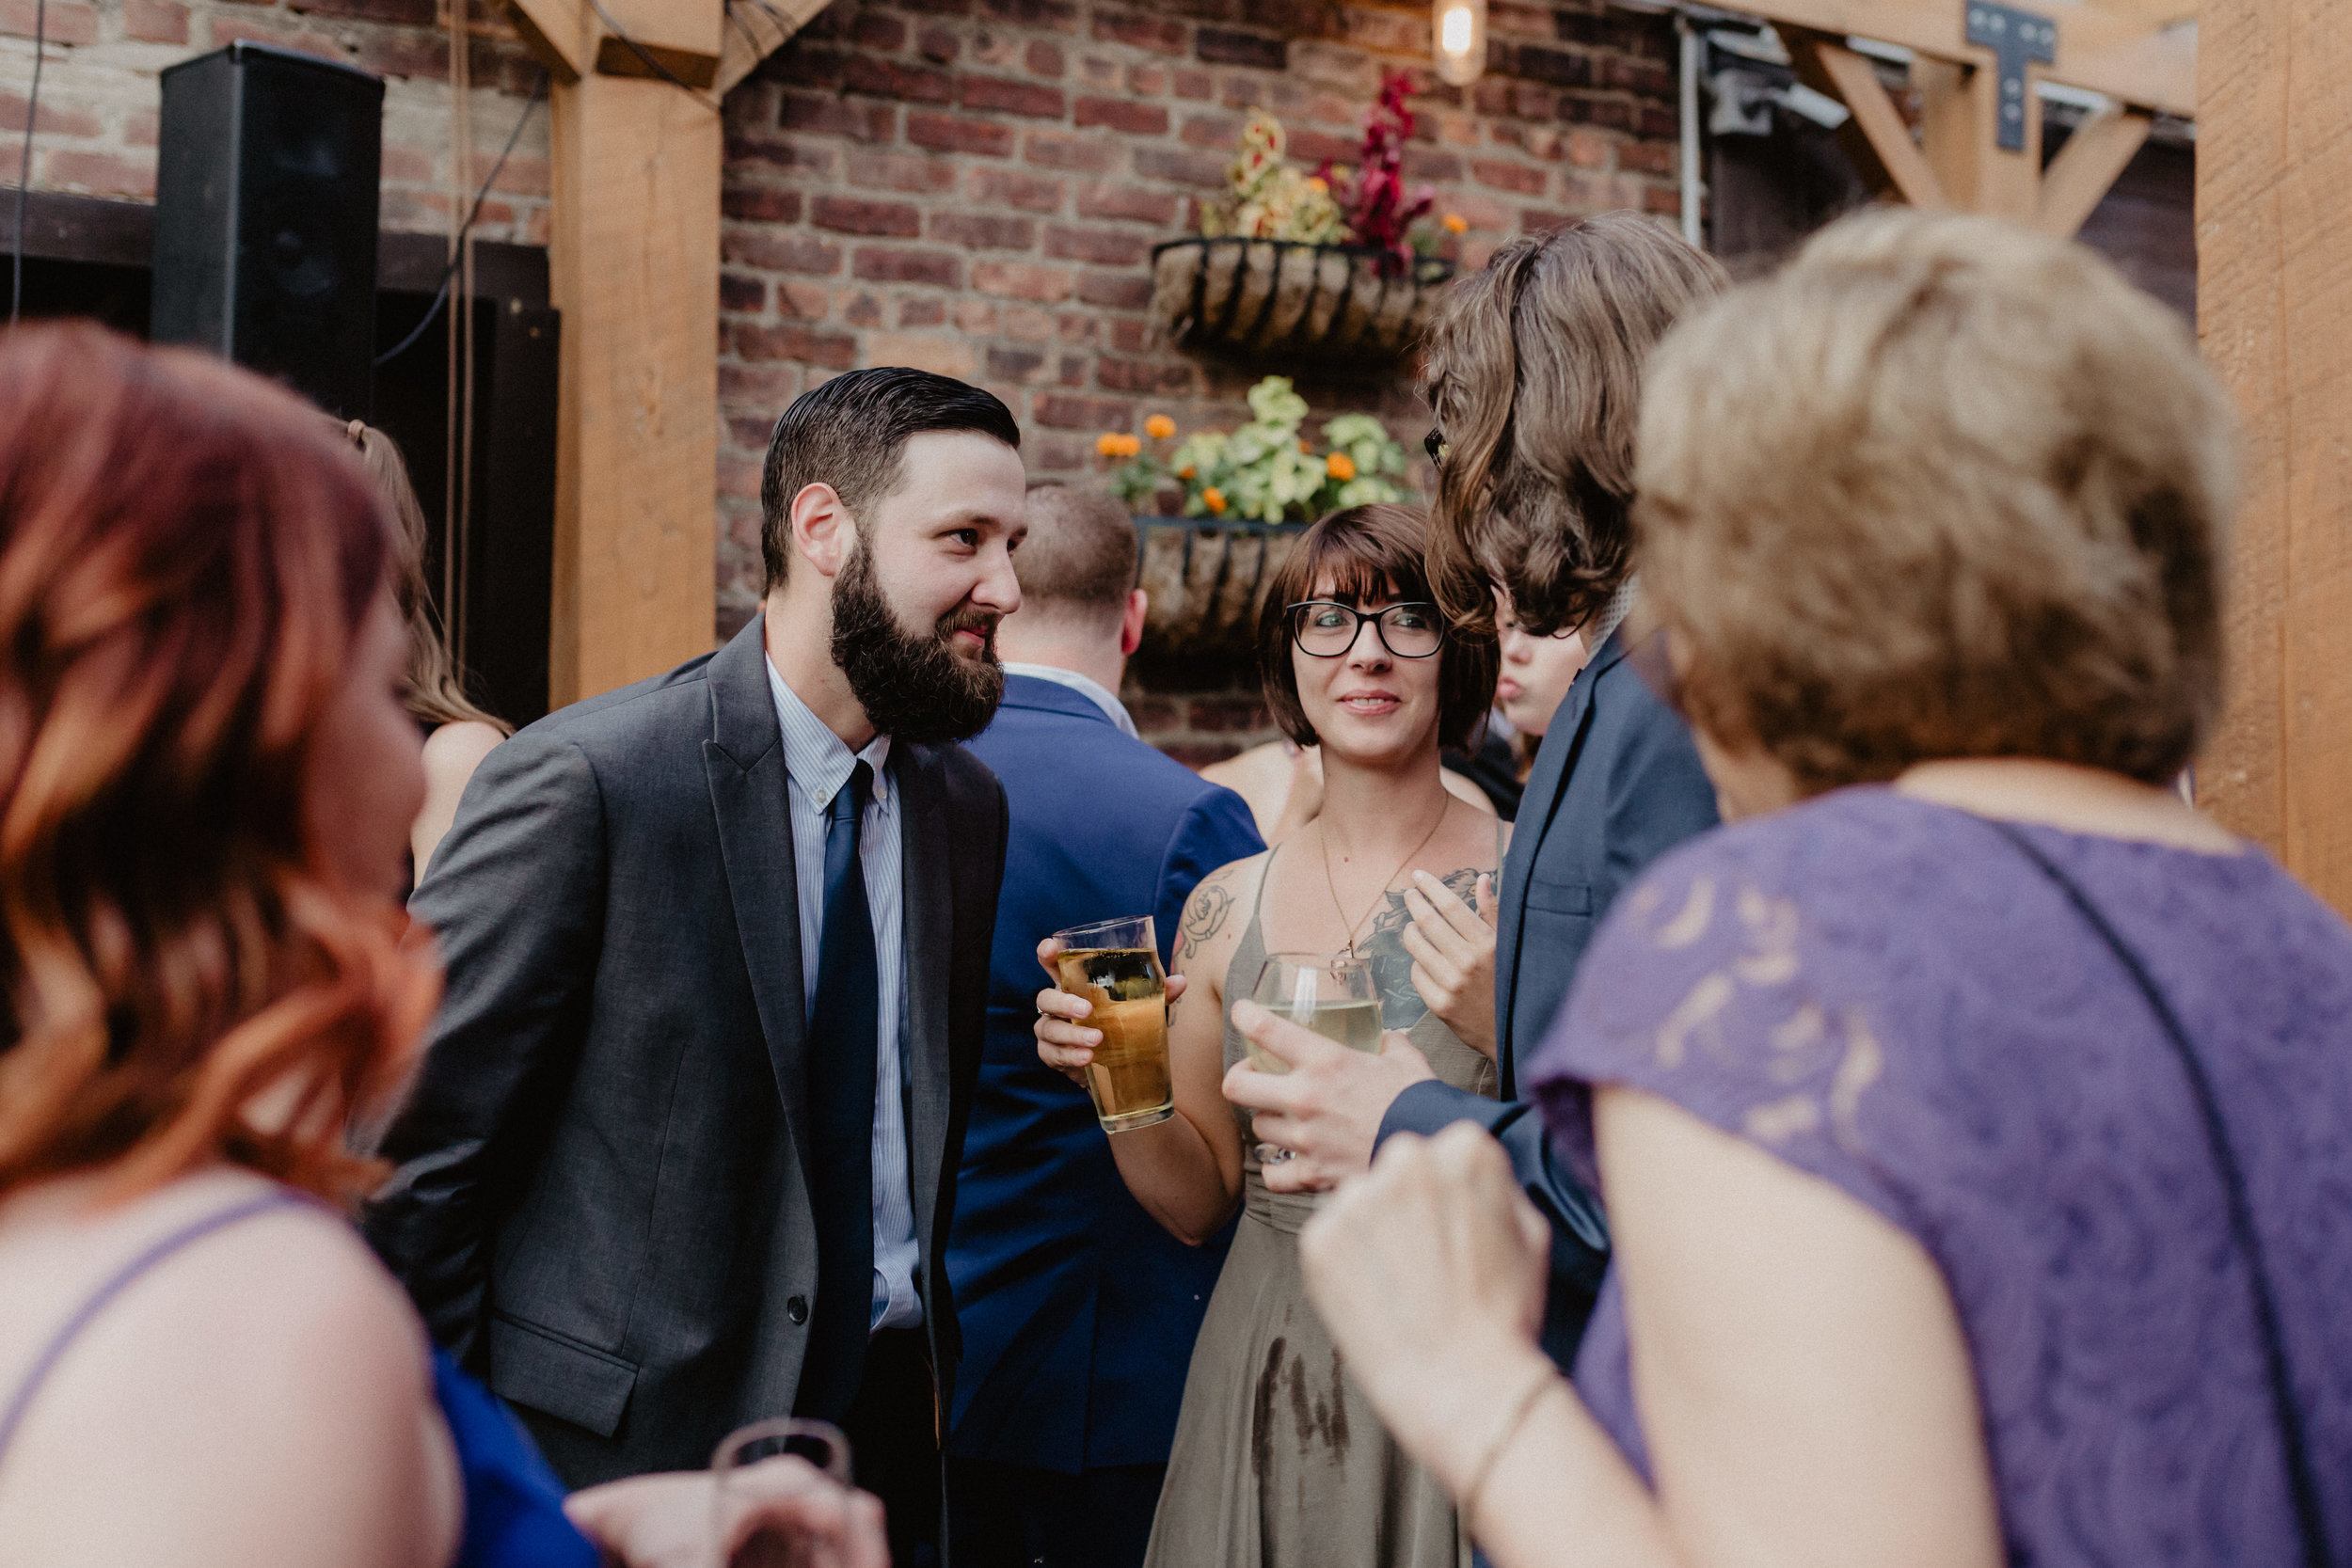 city-beer-hall-wedding-48.jpg